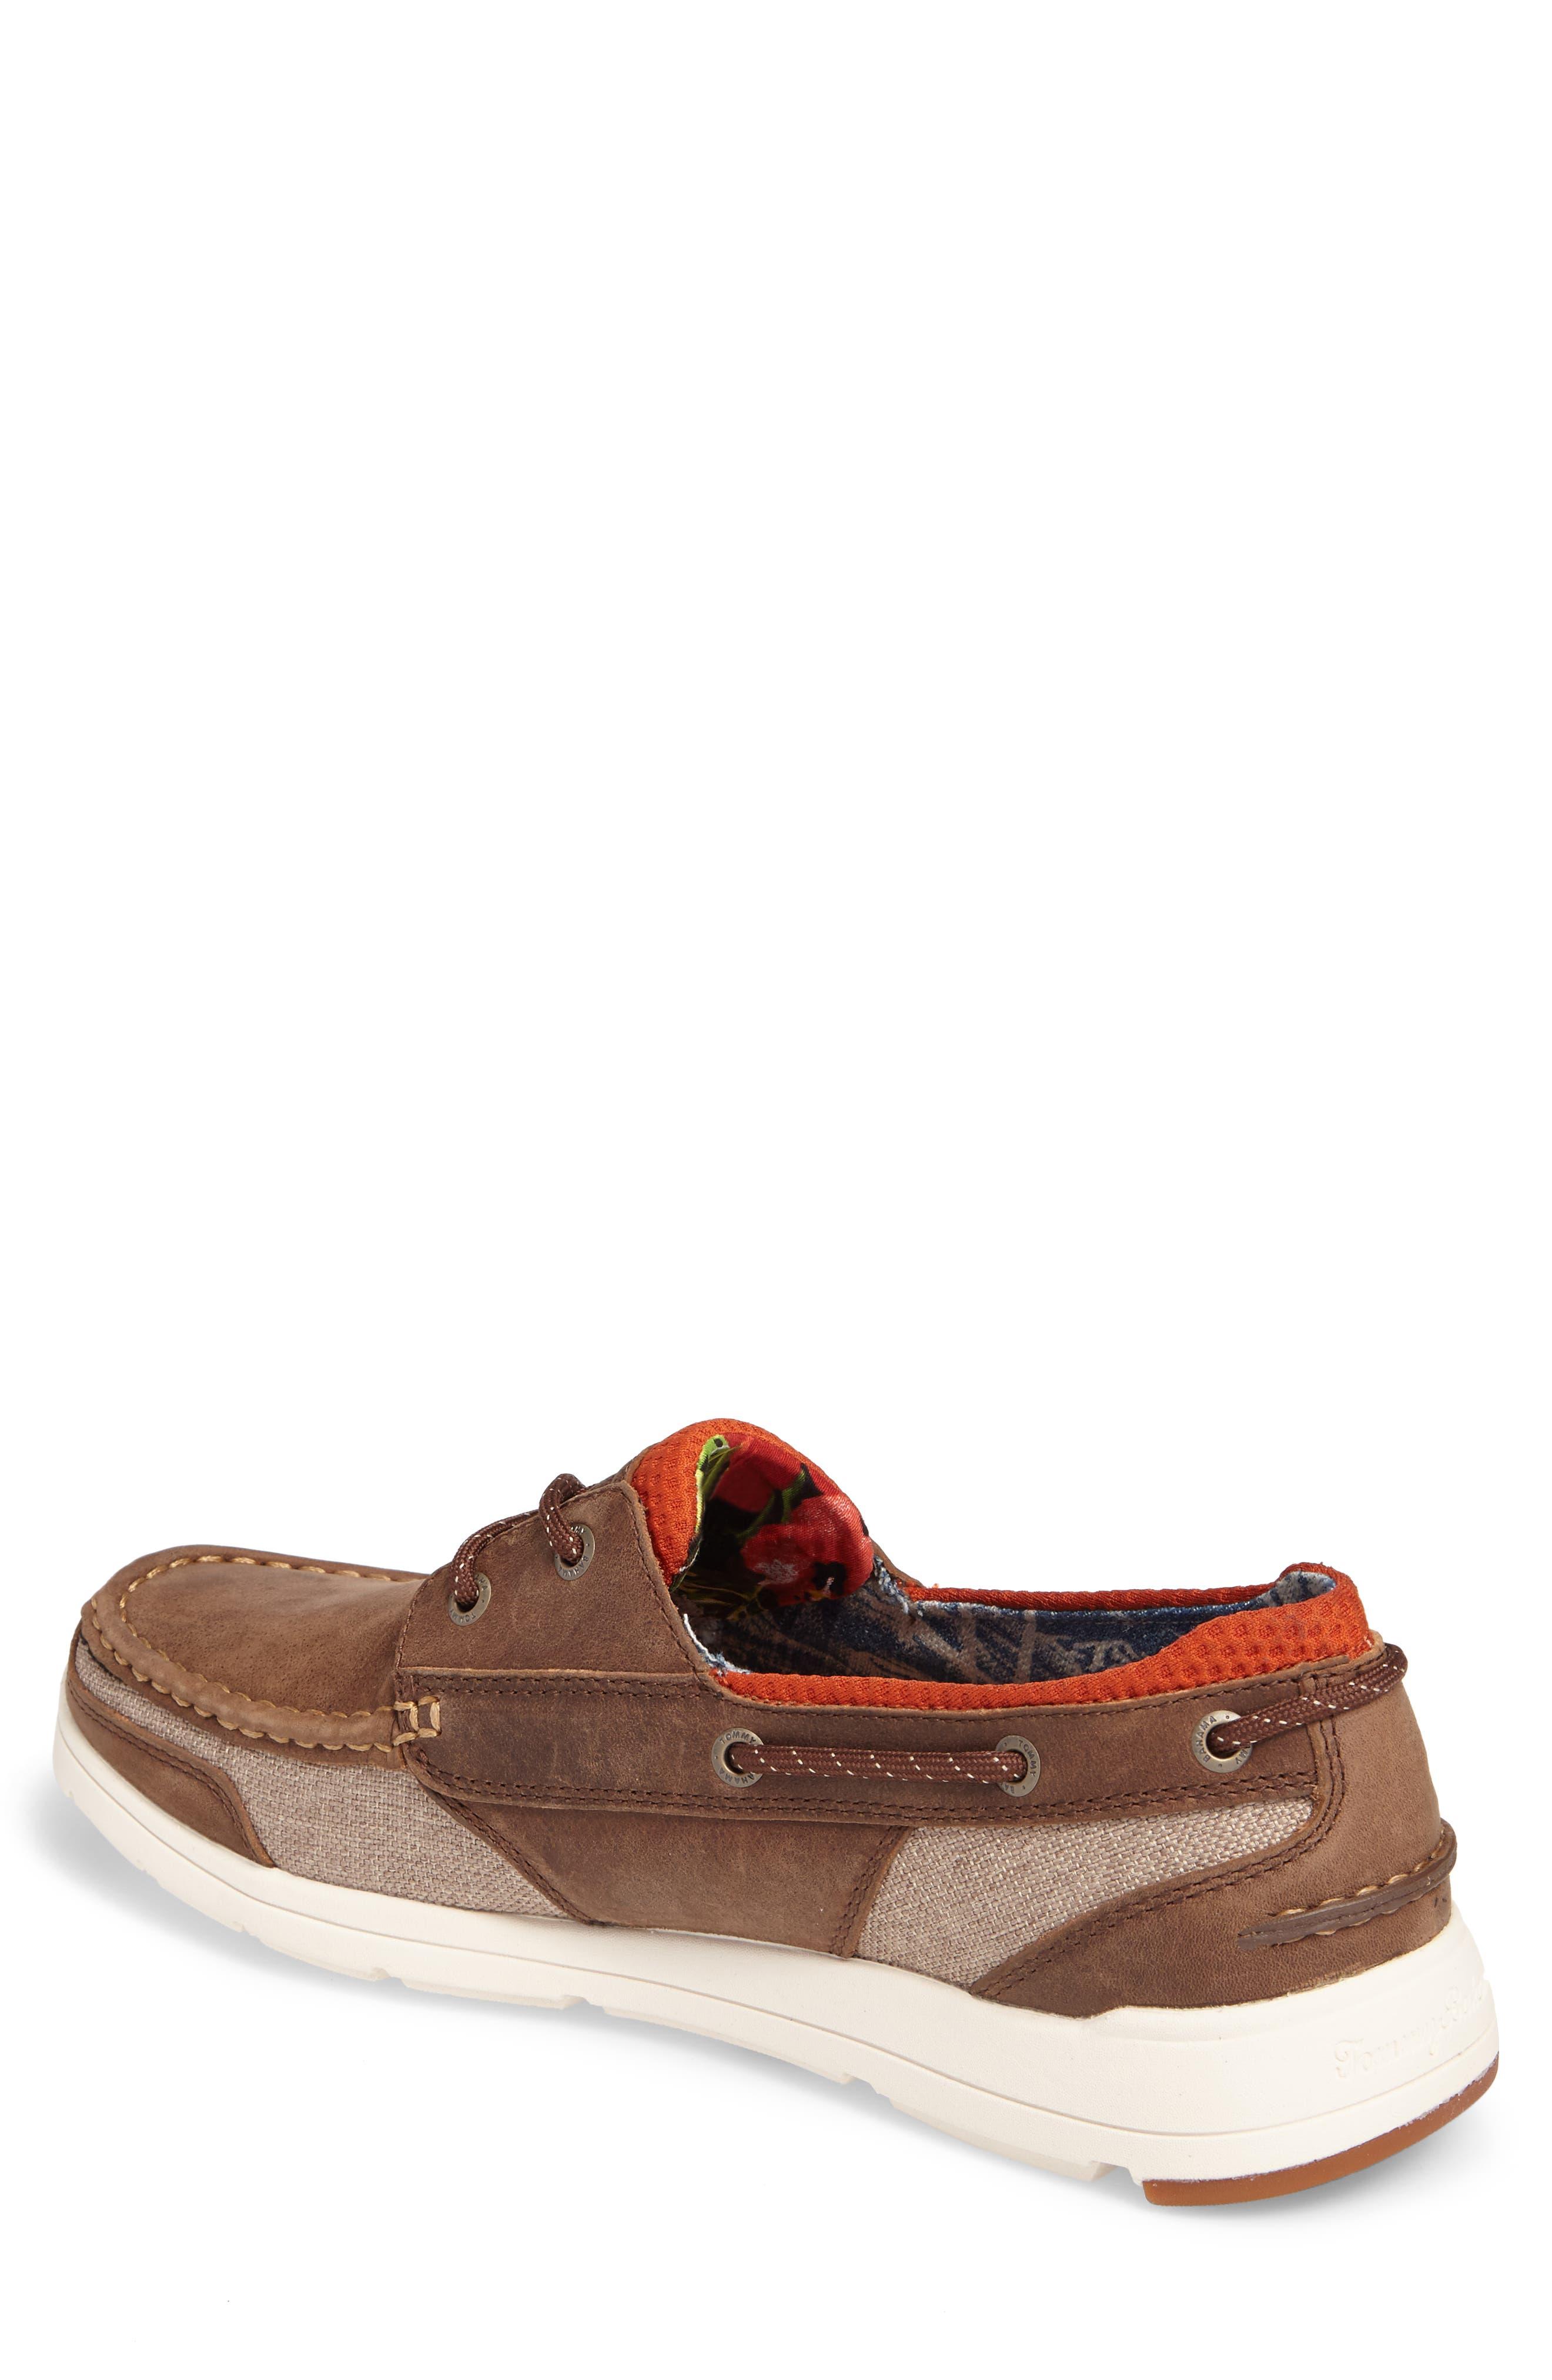 Spectator Boat Shoe,                             Alternate thumbnail 2, color,                             204